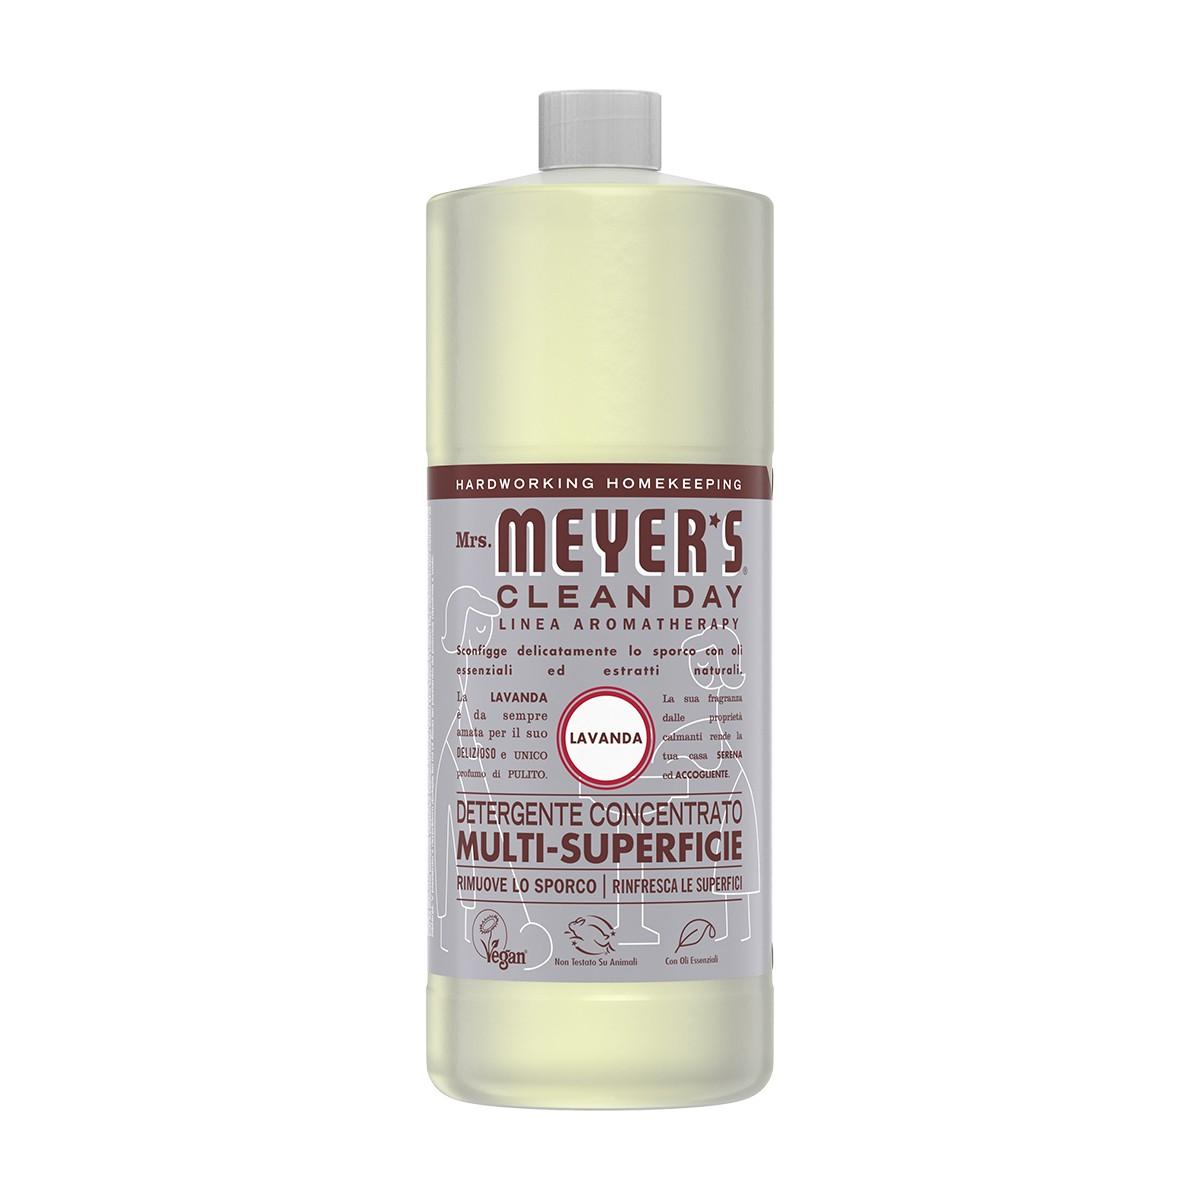 Mrs Meyer's Detergente Concentrato Lavanda